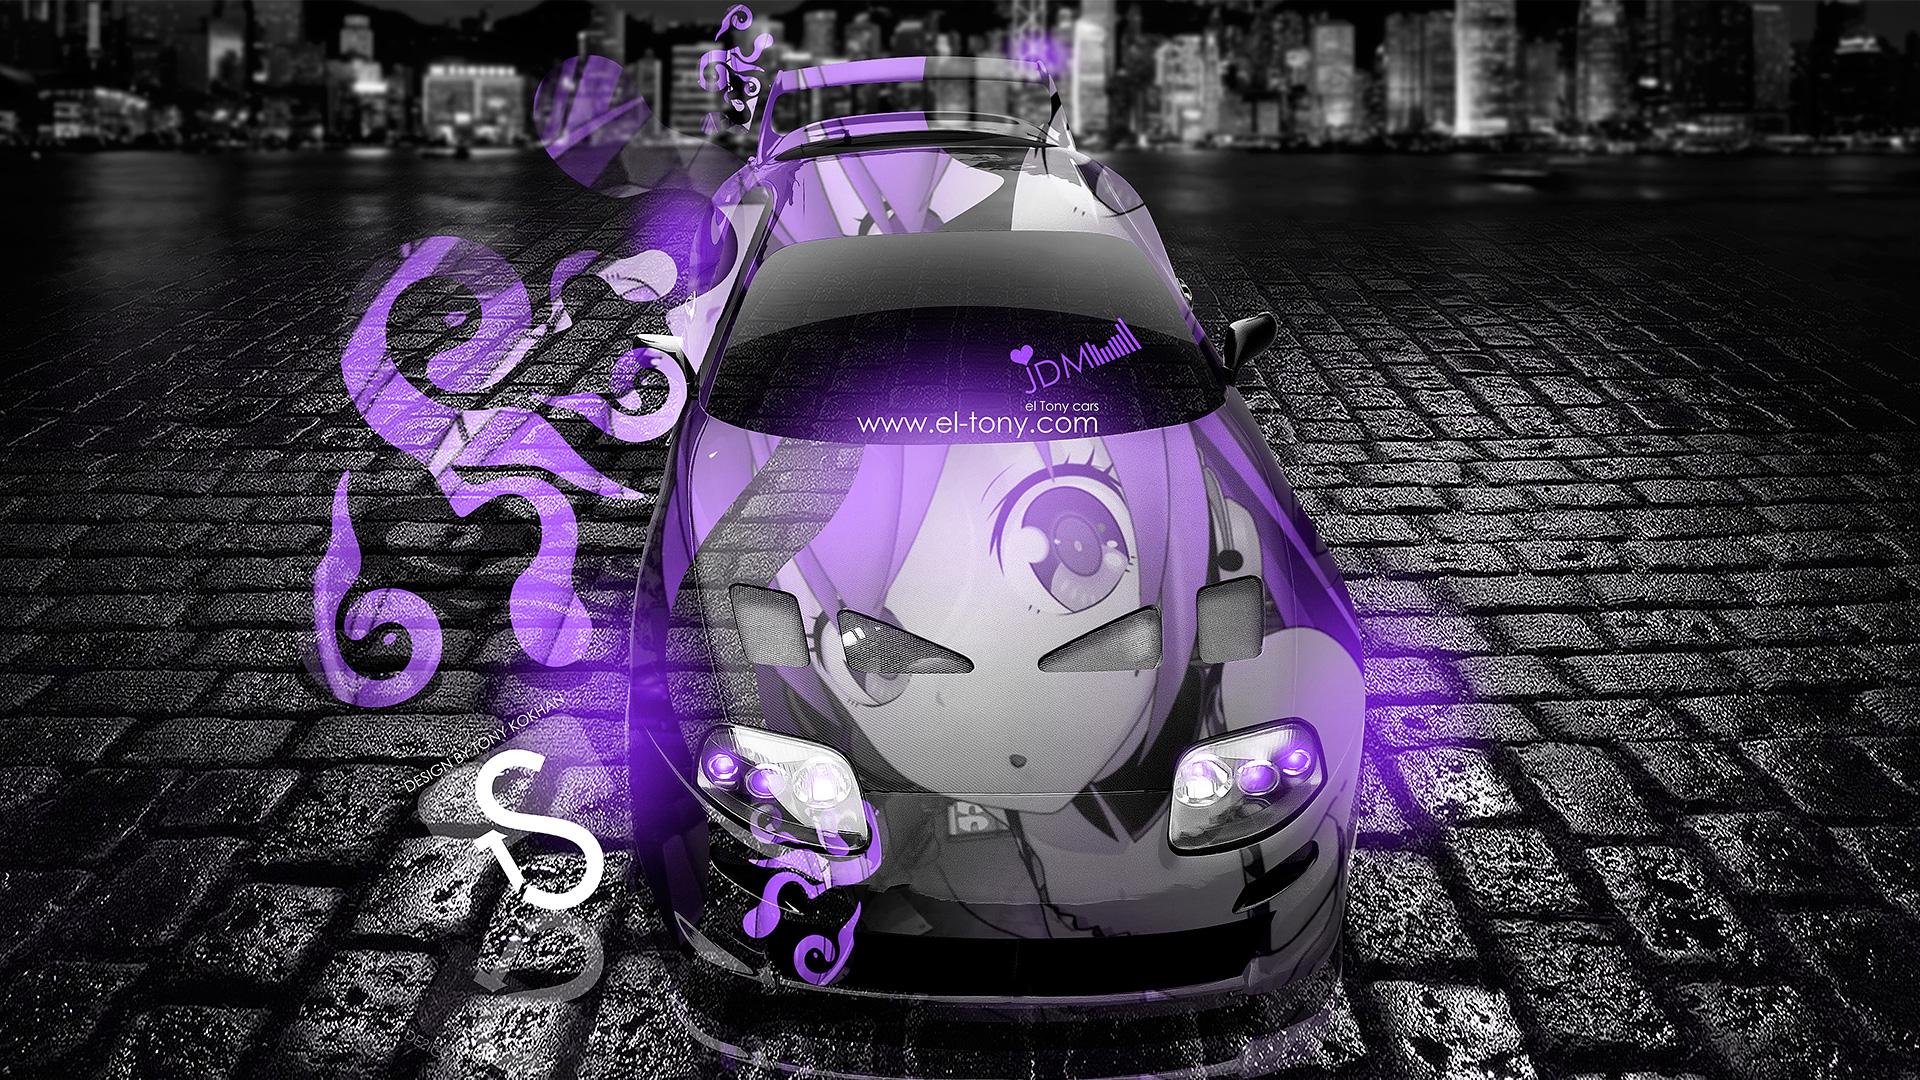 Toyota Supra Anime Fantasy Jdm Car 2013 Violet Neon Hd Wallpapers